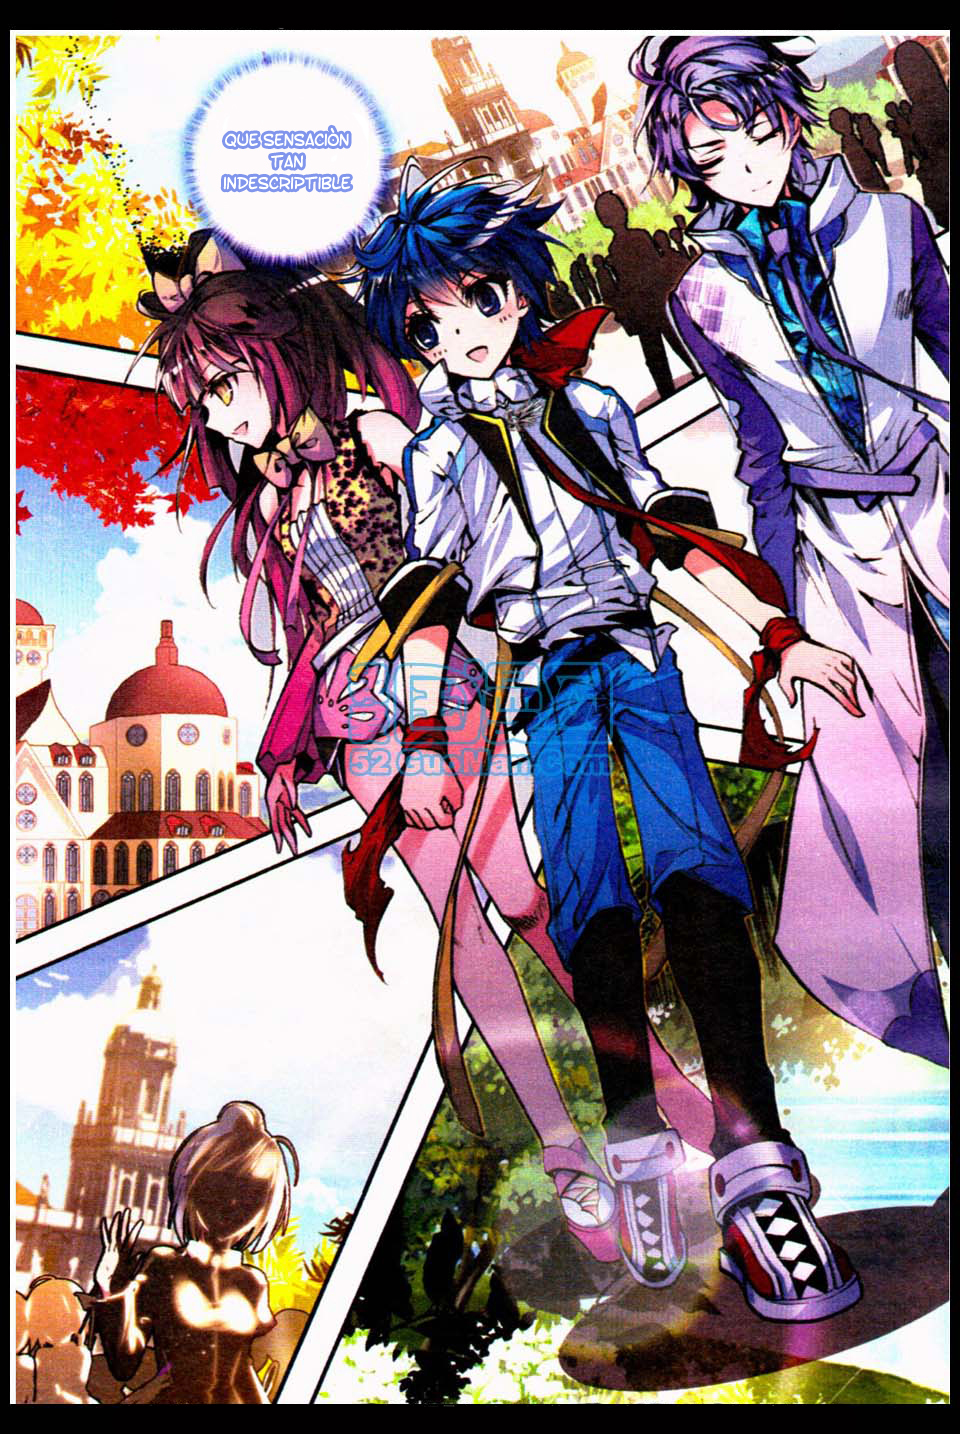 http://c5.ninemanga.com/es_manga/33/16417/417400/310cb5a7d908be1e69b95472d94575de.jpg Page 10